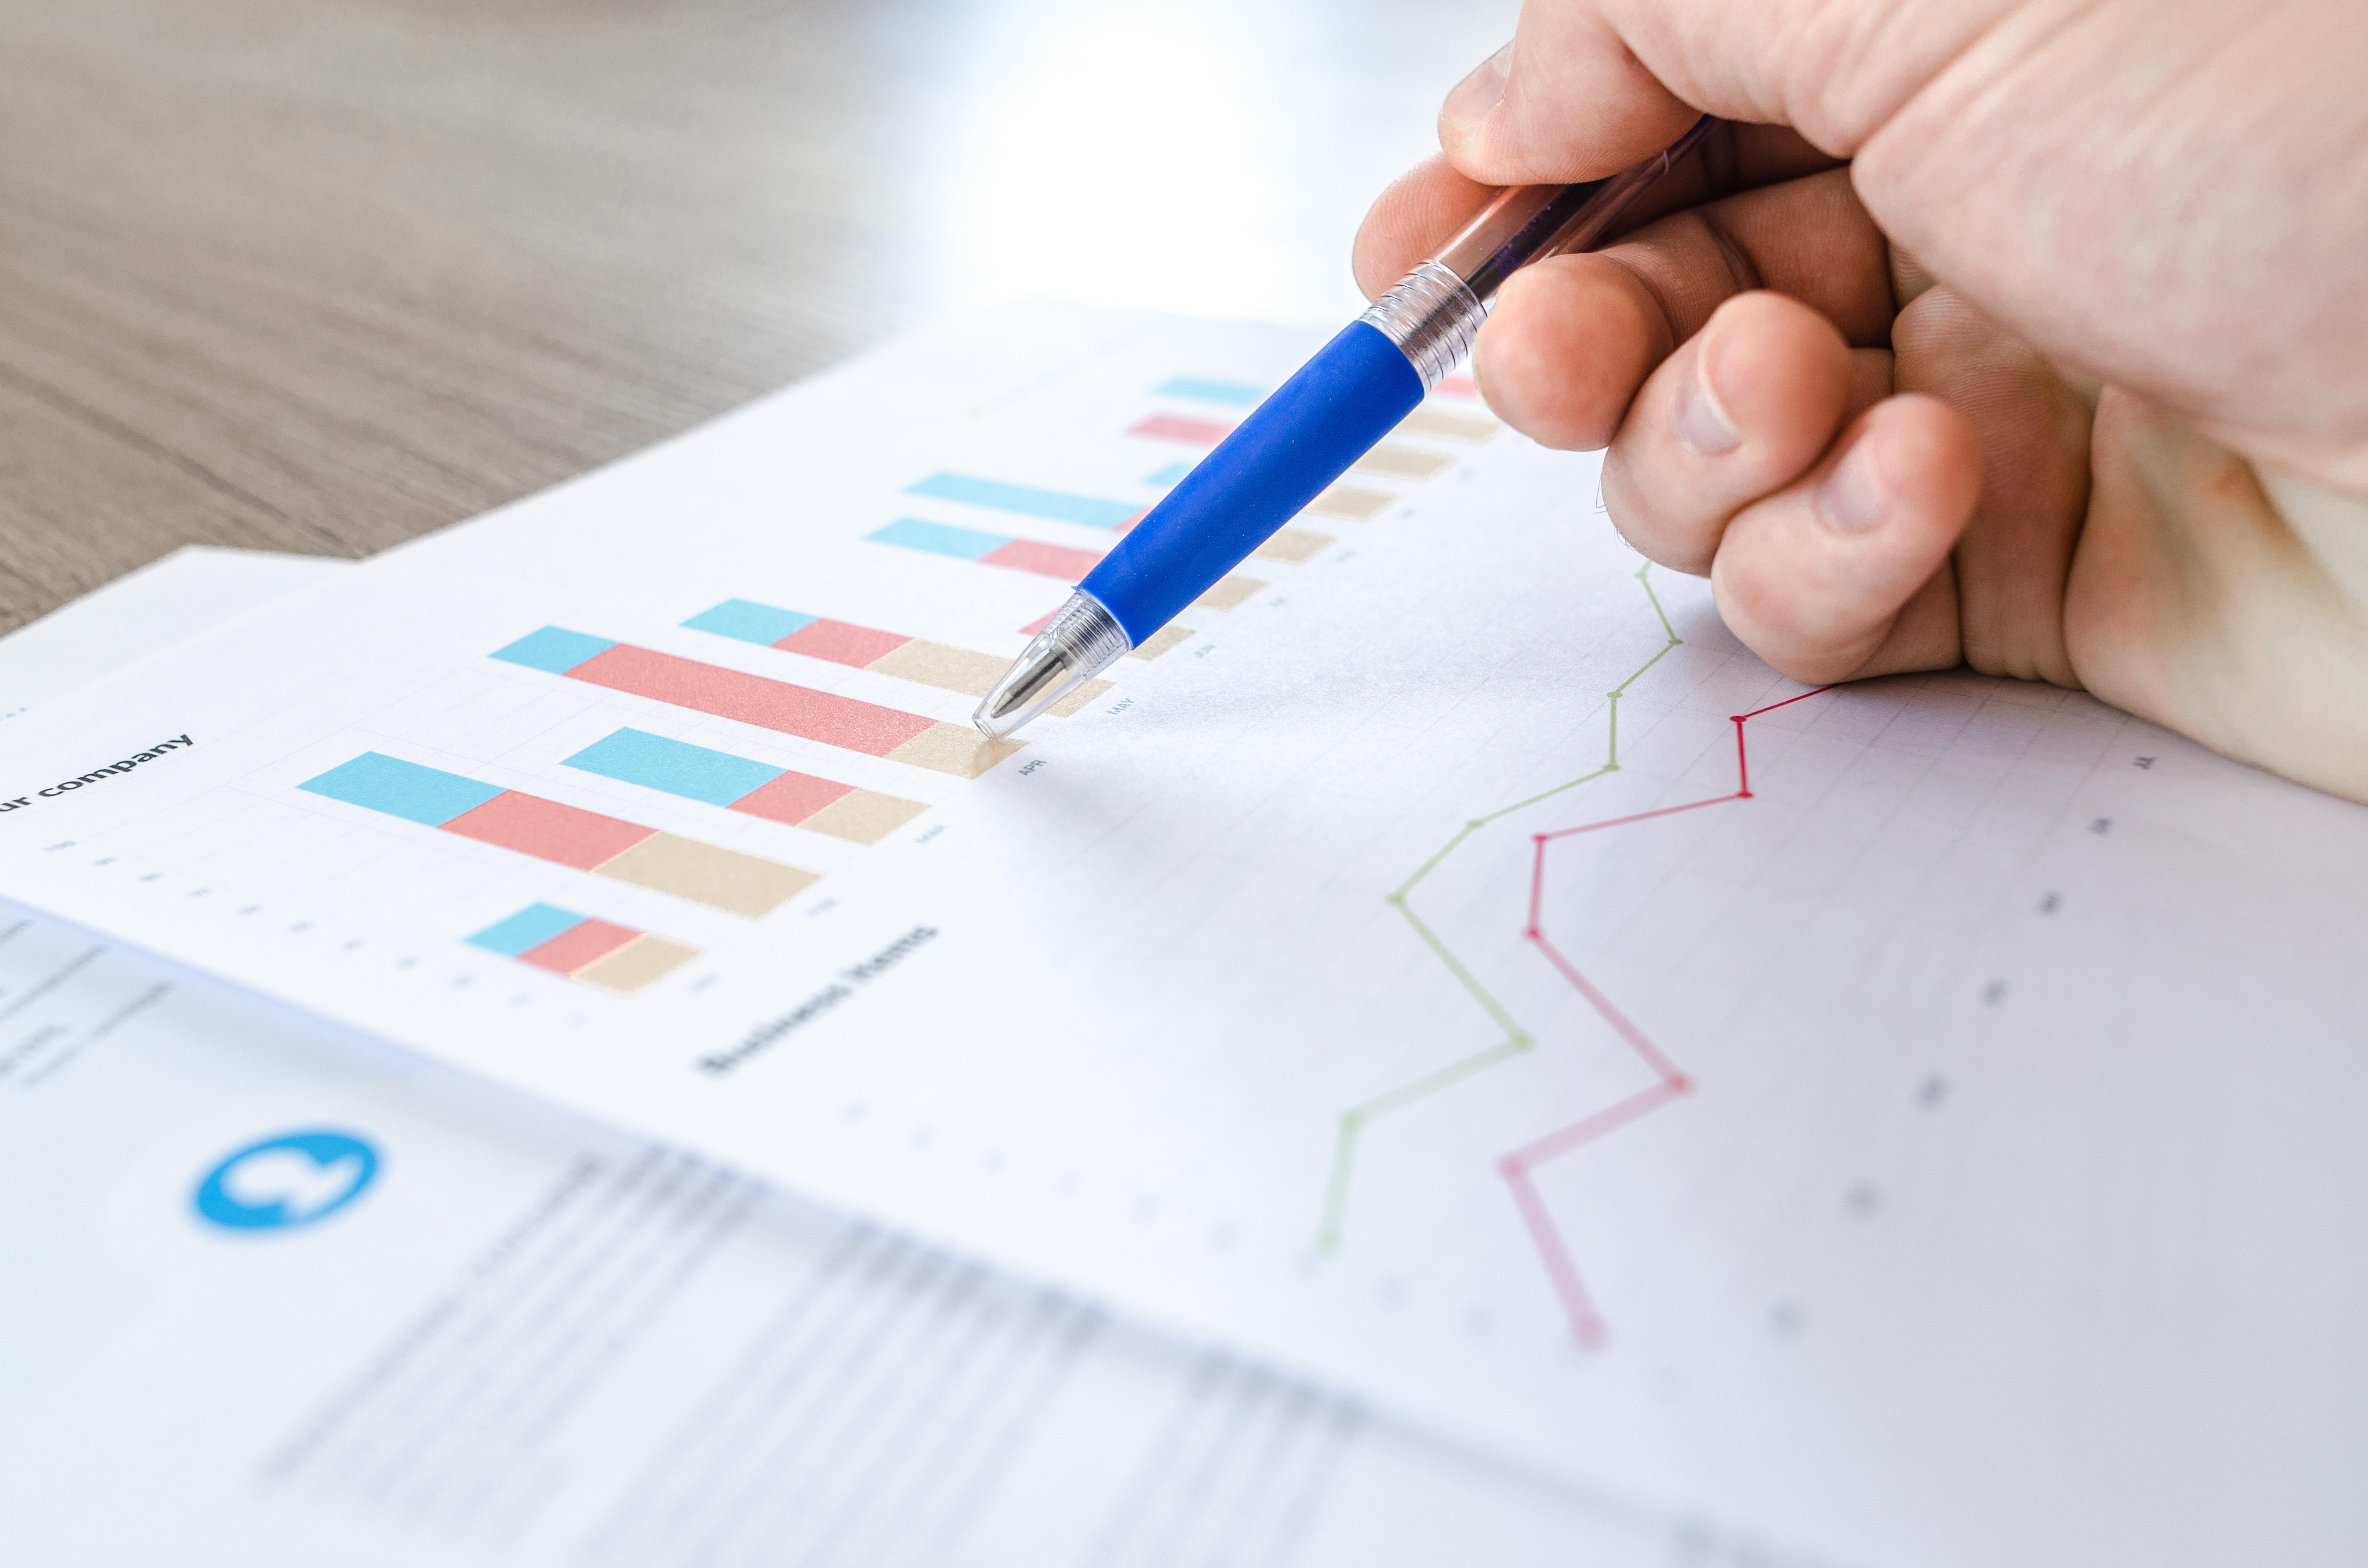 Análisis de mercado como herramienta estratégica: sus 4 etapas